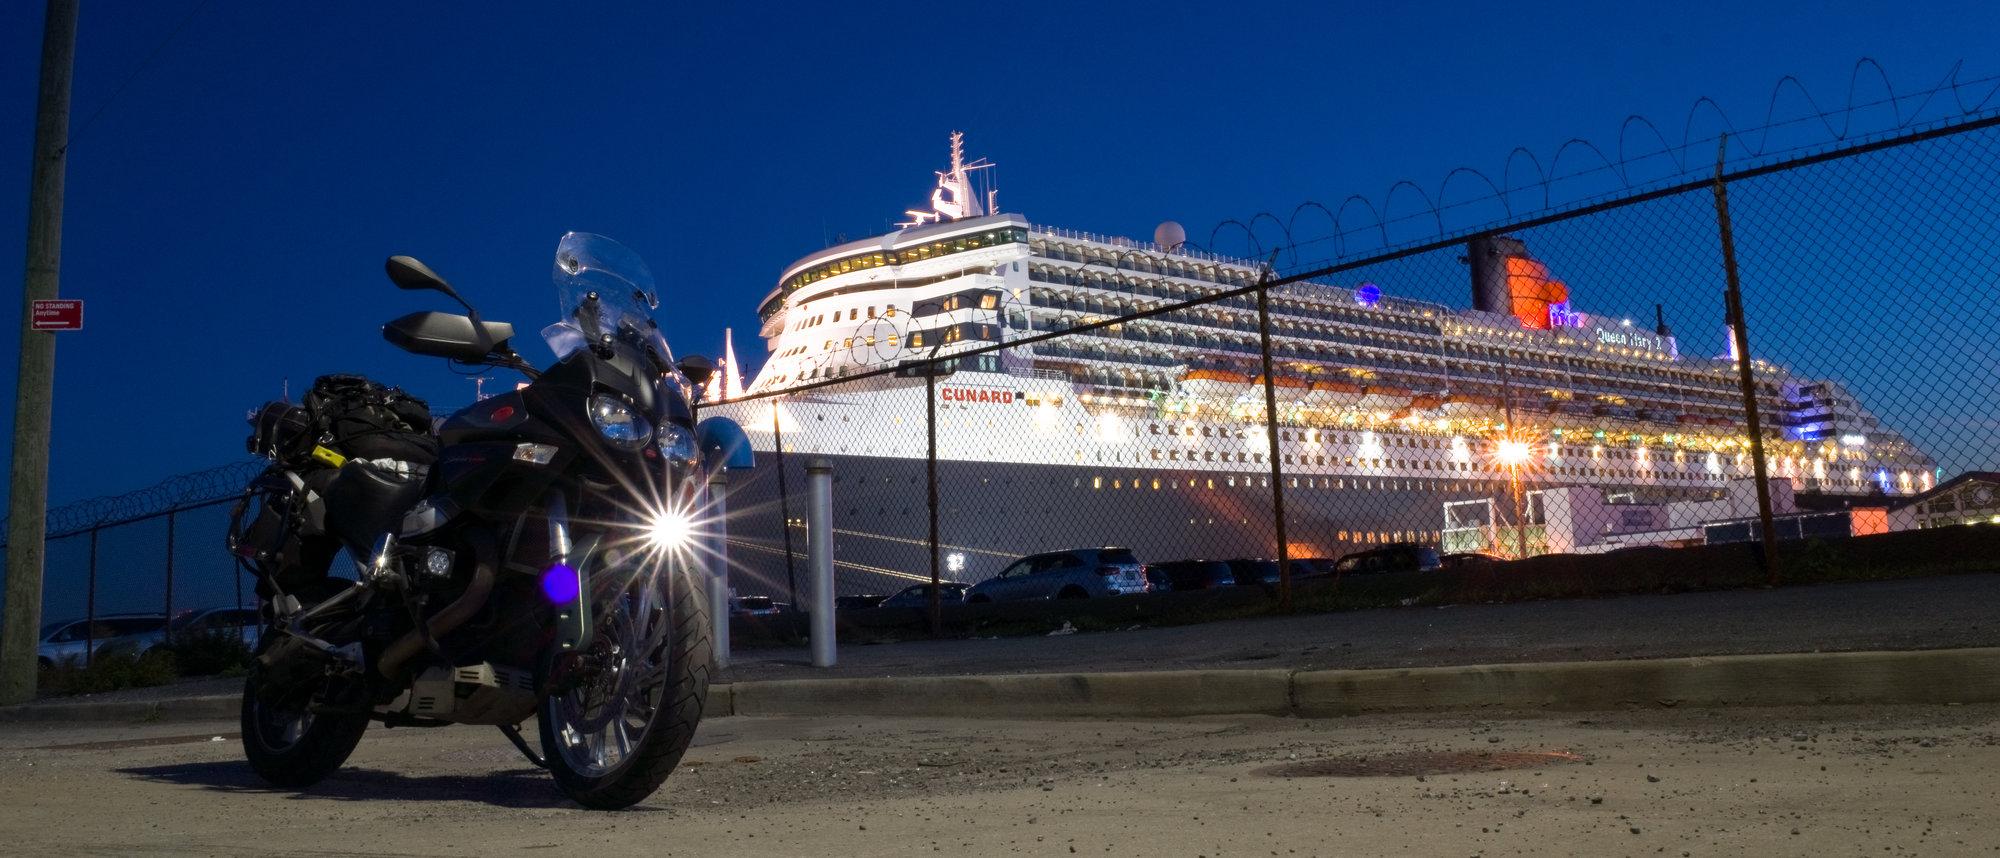 cruise ship superstar (1 of 1).jpg